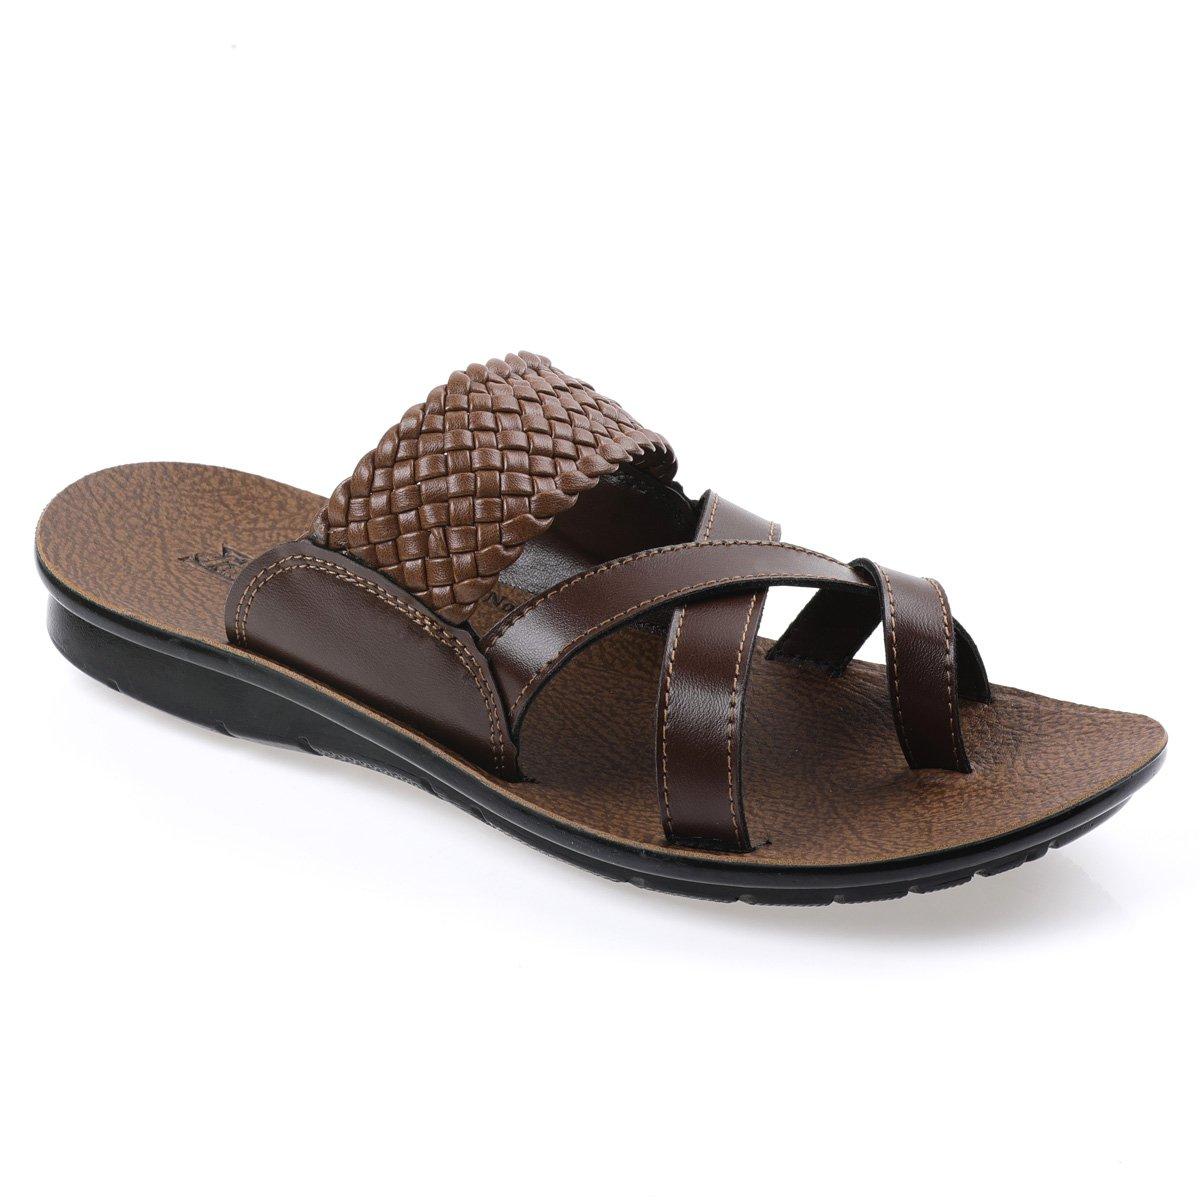 Buy PARAGON Men's Brown Thong Sandals-9